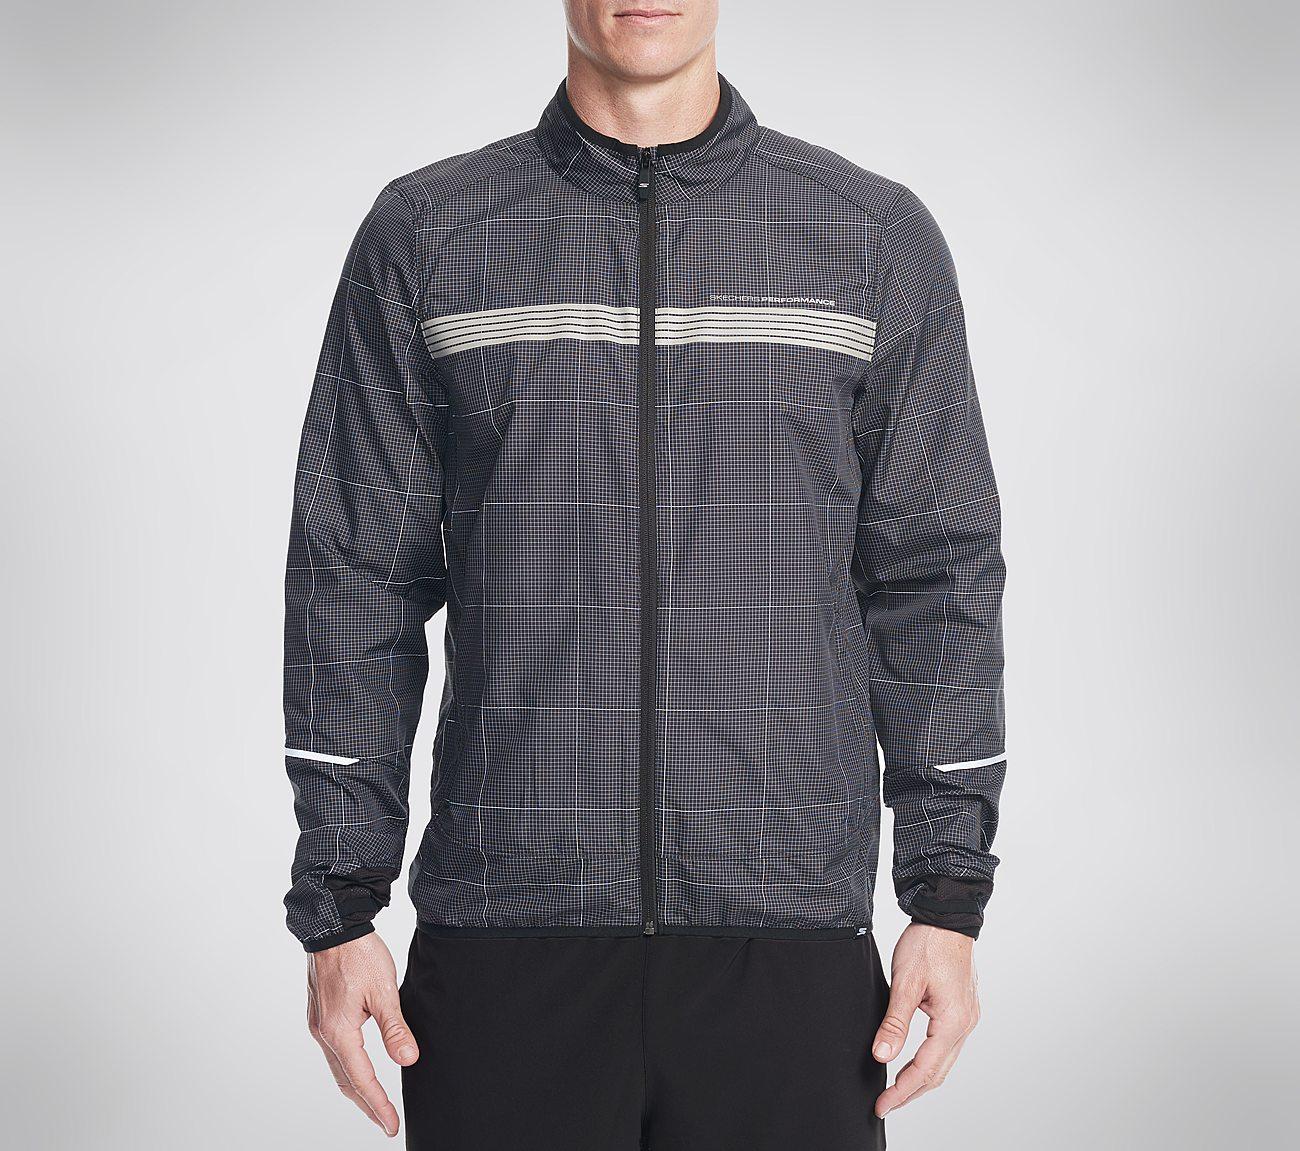 Paceline Packable Jacket